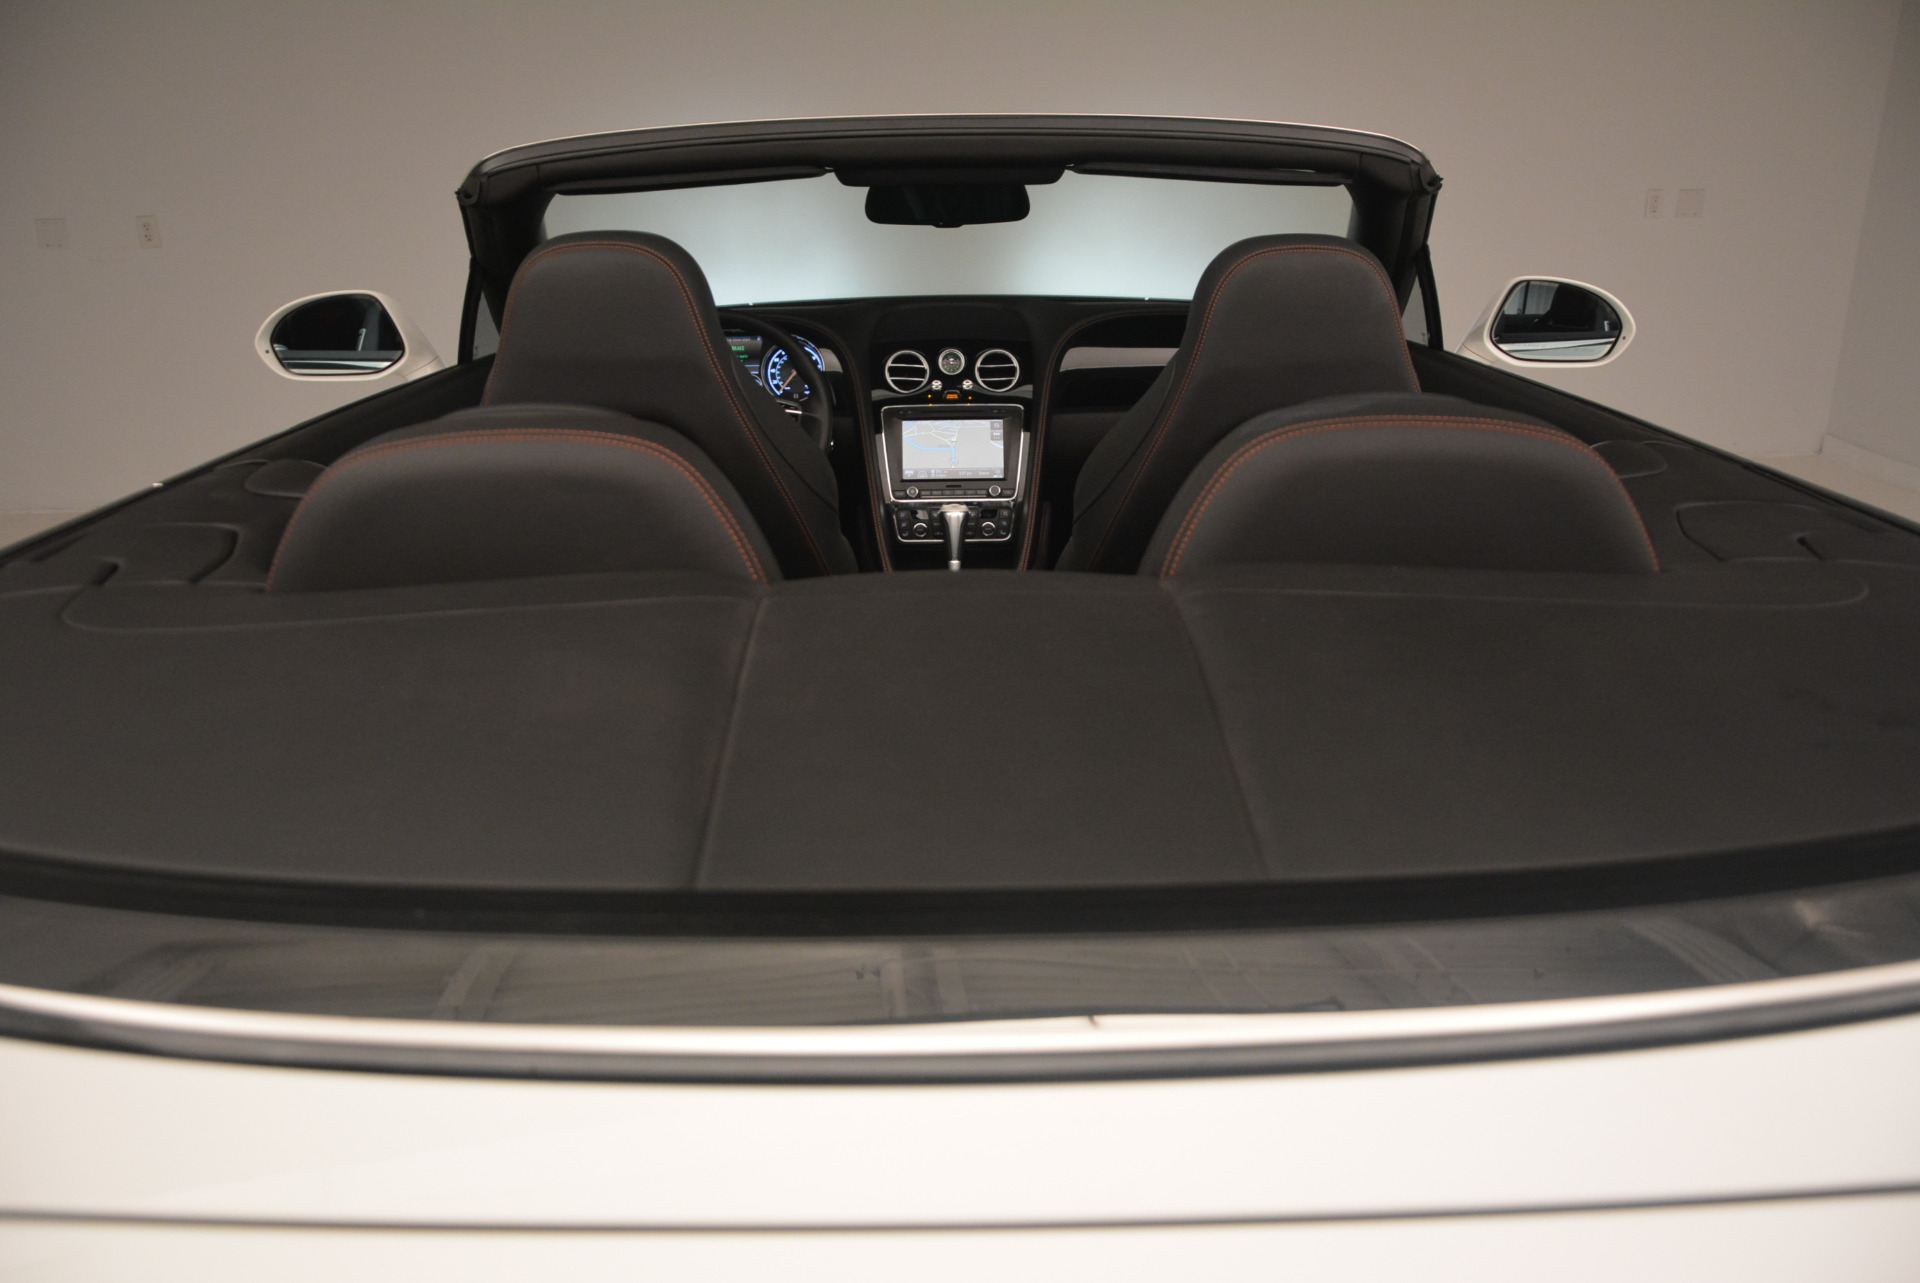 Used 2014 Bentley Continental GT Speed For Sale In Westport, CT 1129_p43